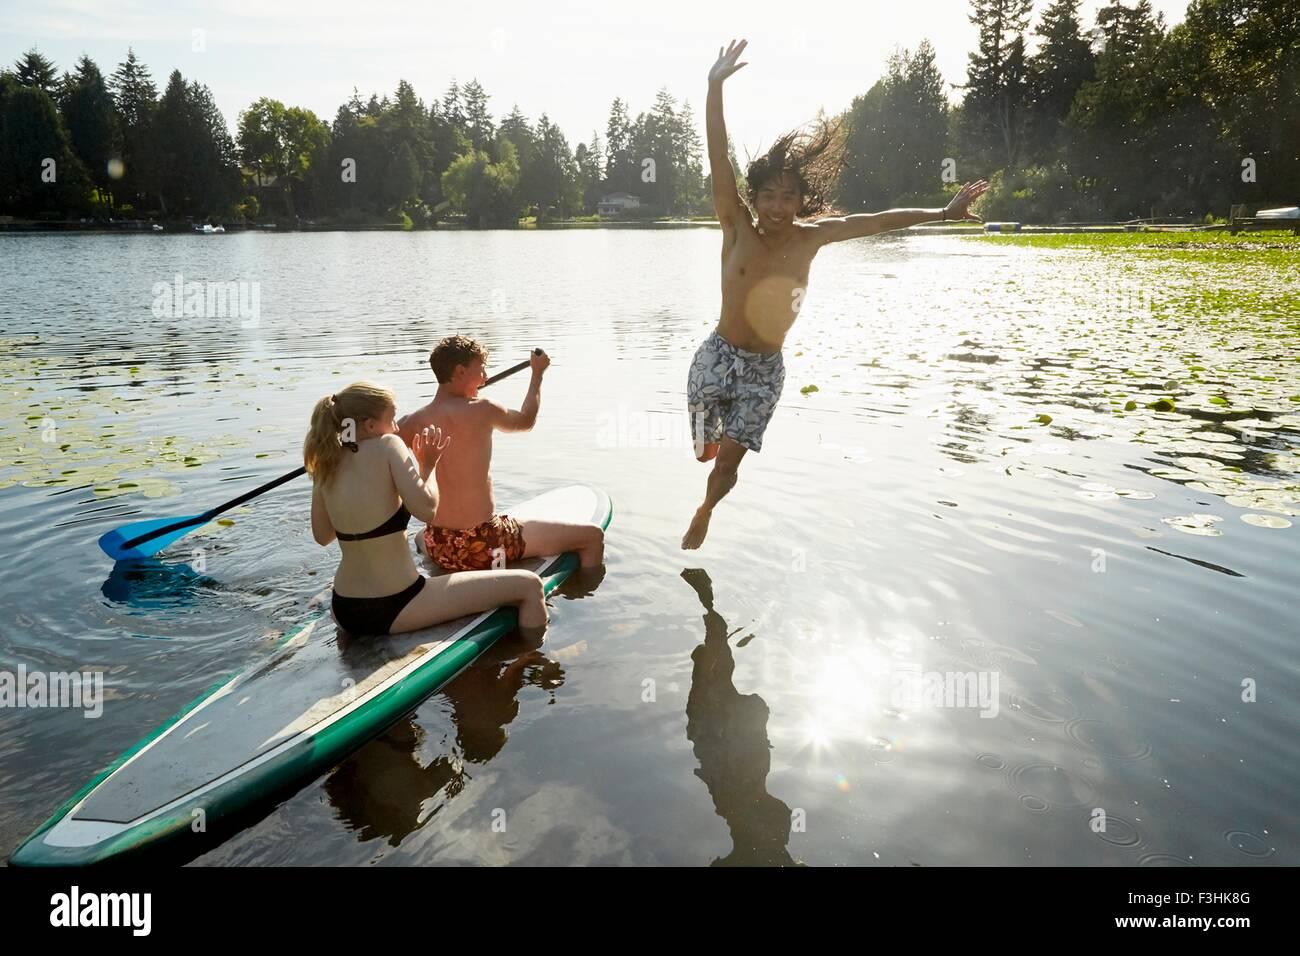 Couple paddling boat, man jumping into lake, Seattle, Washington, USA - Stock Image